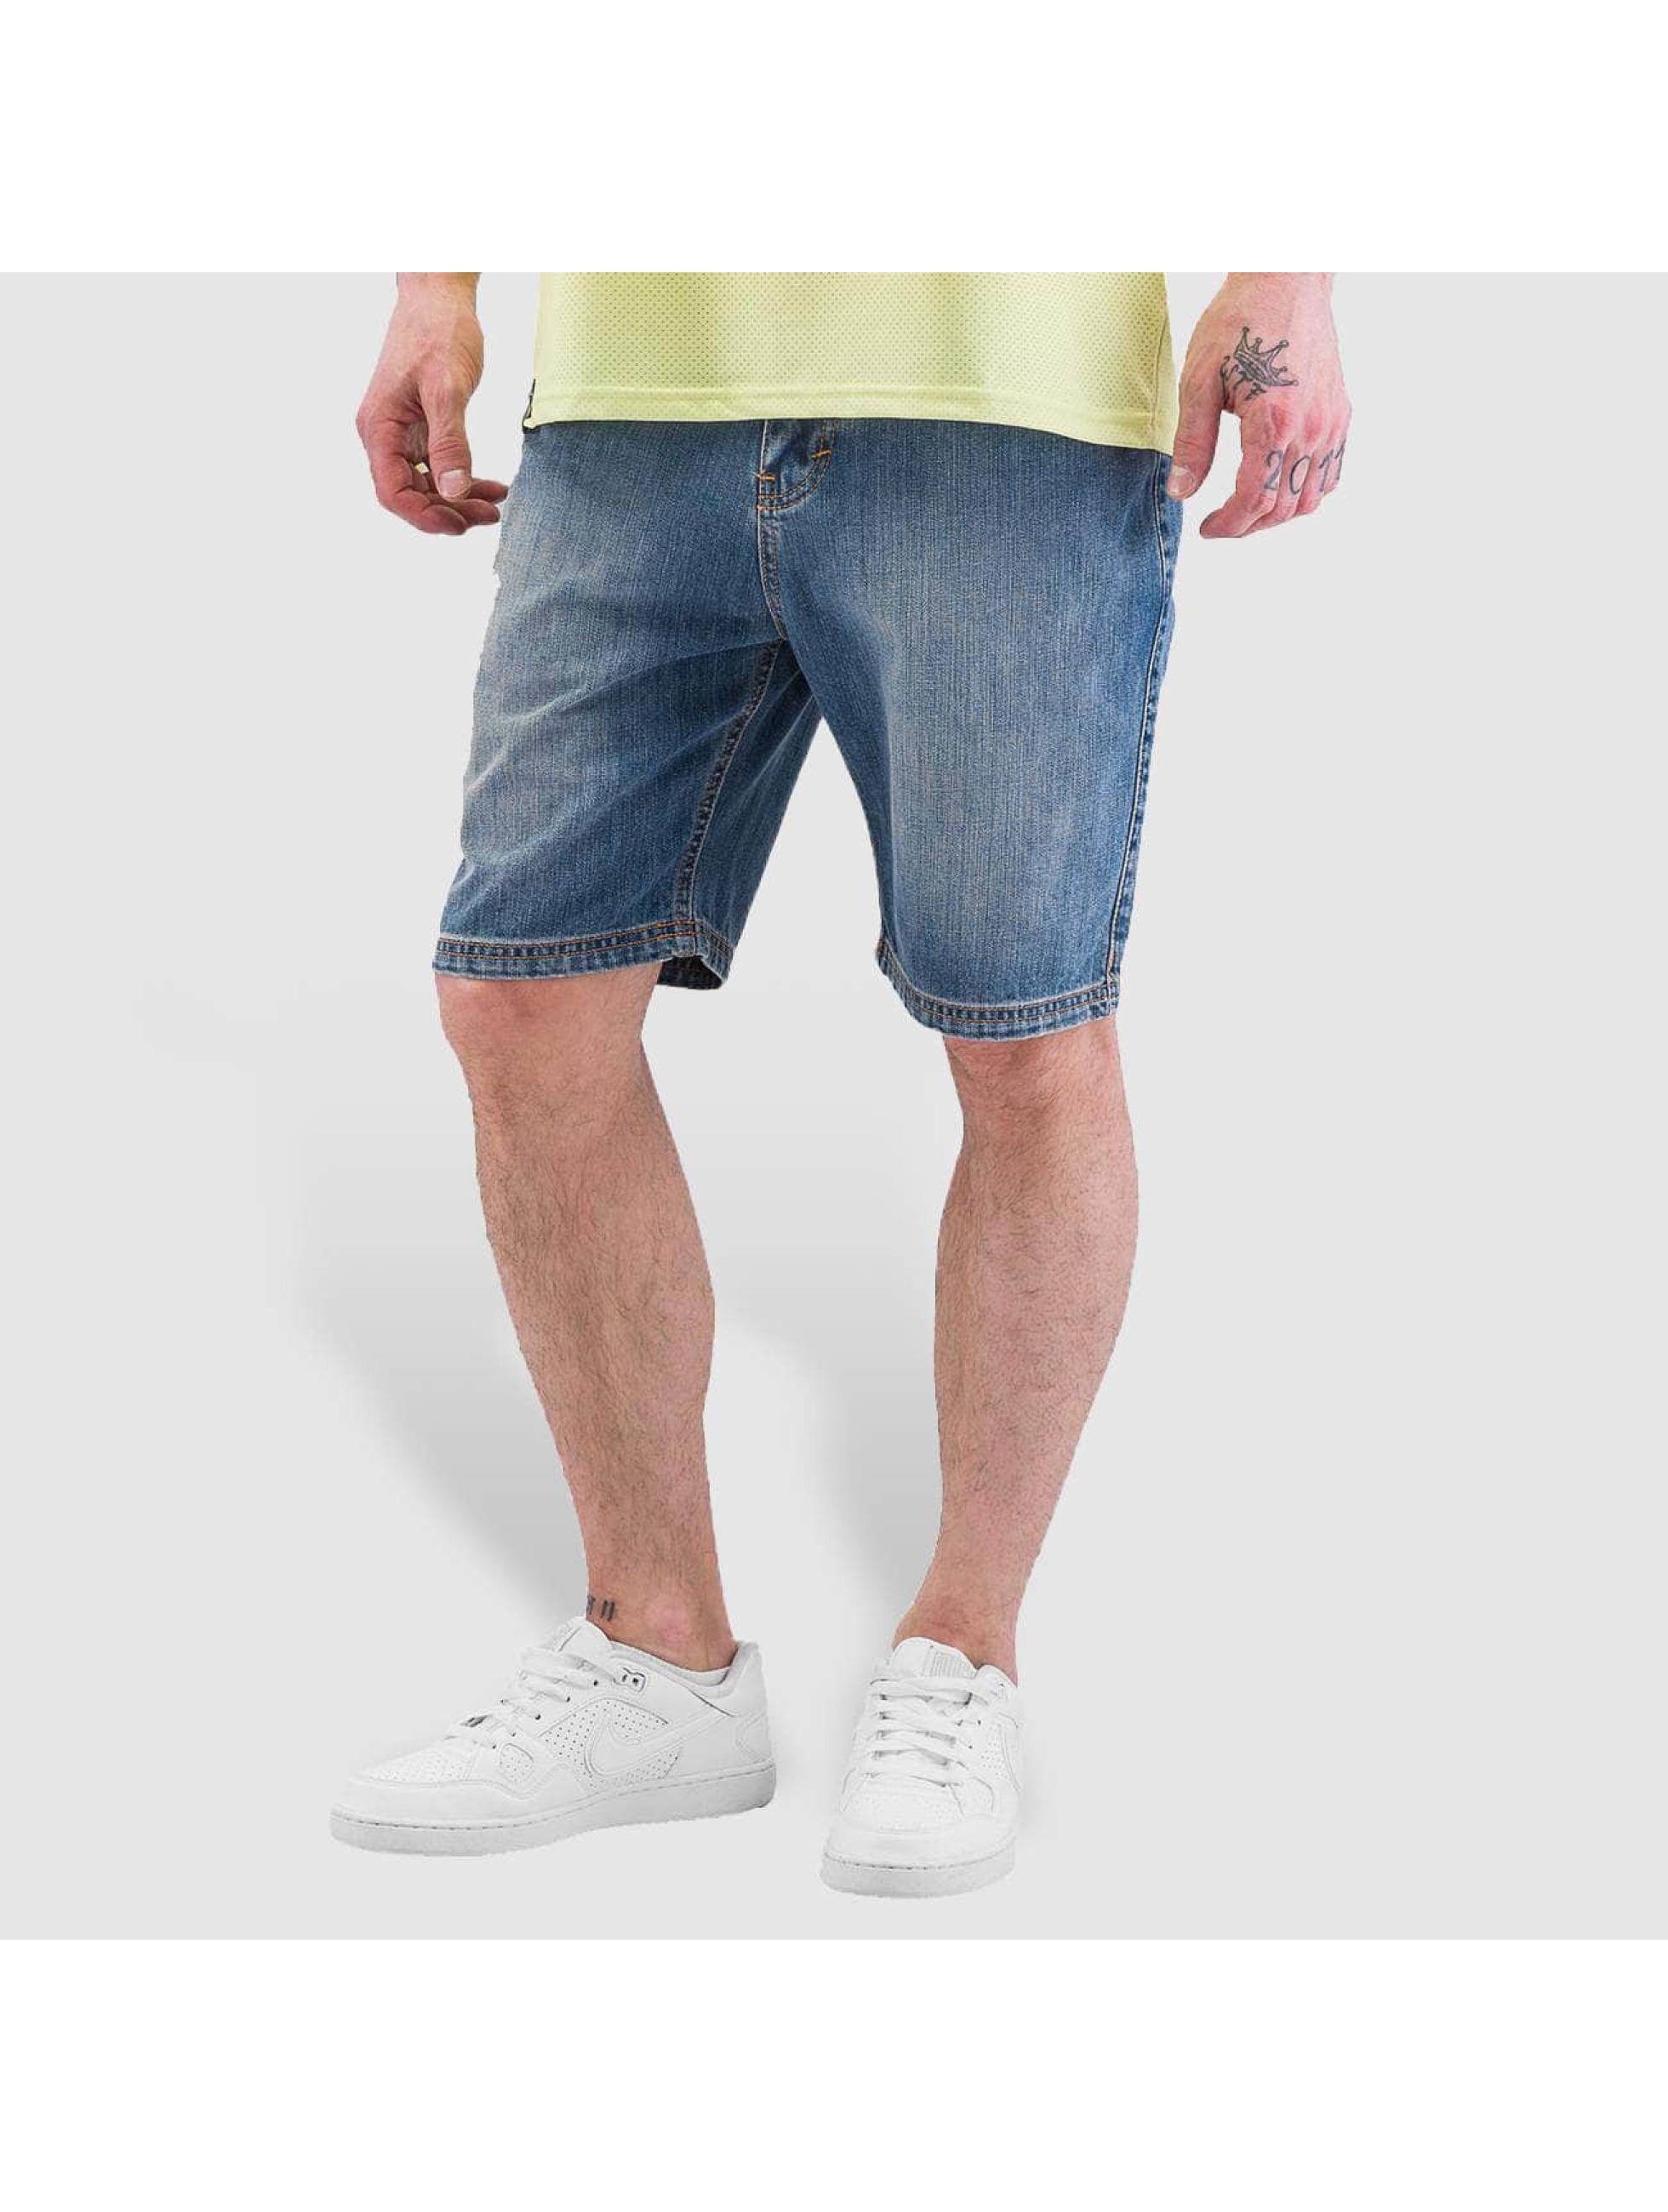 Grimey Wear Classic Shorts Washed Blue Sale Angebote Döbern